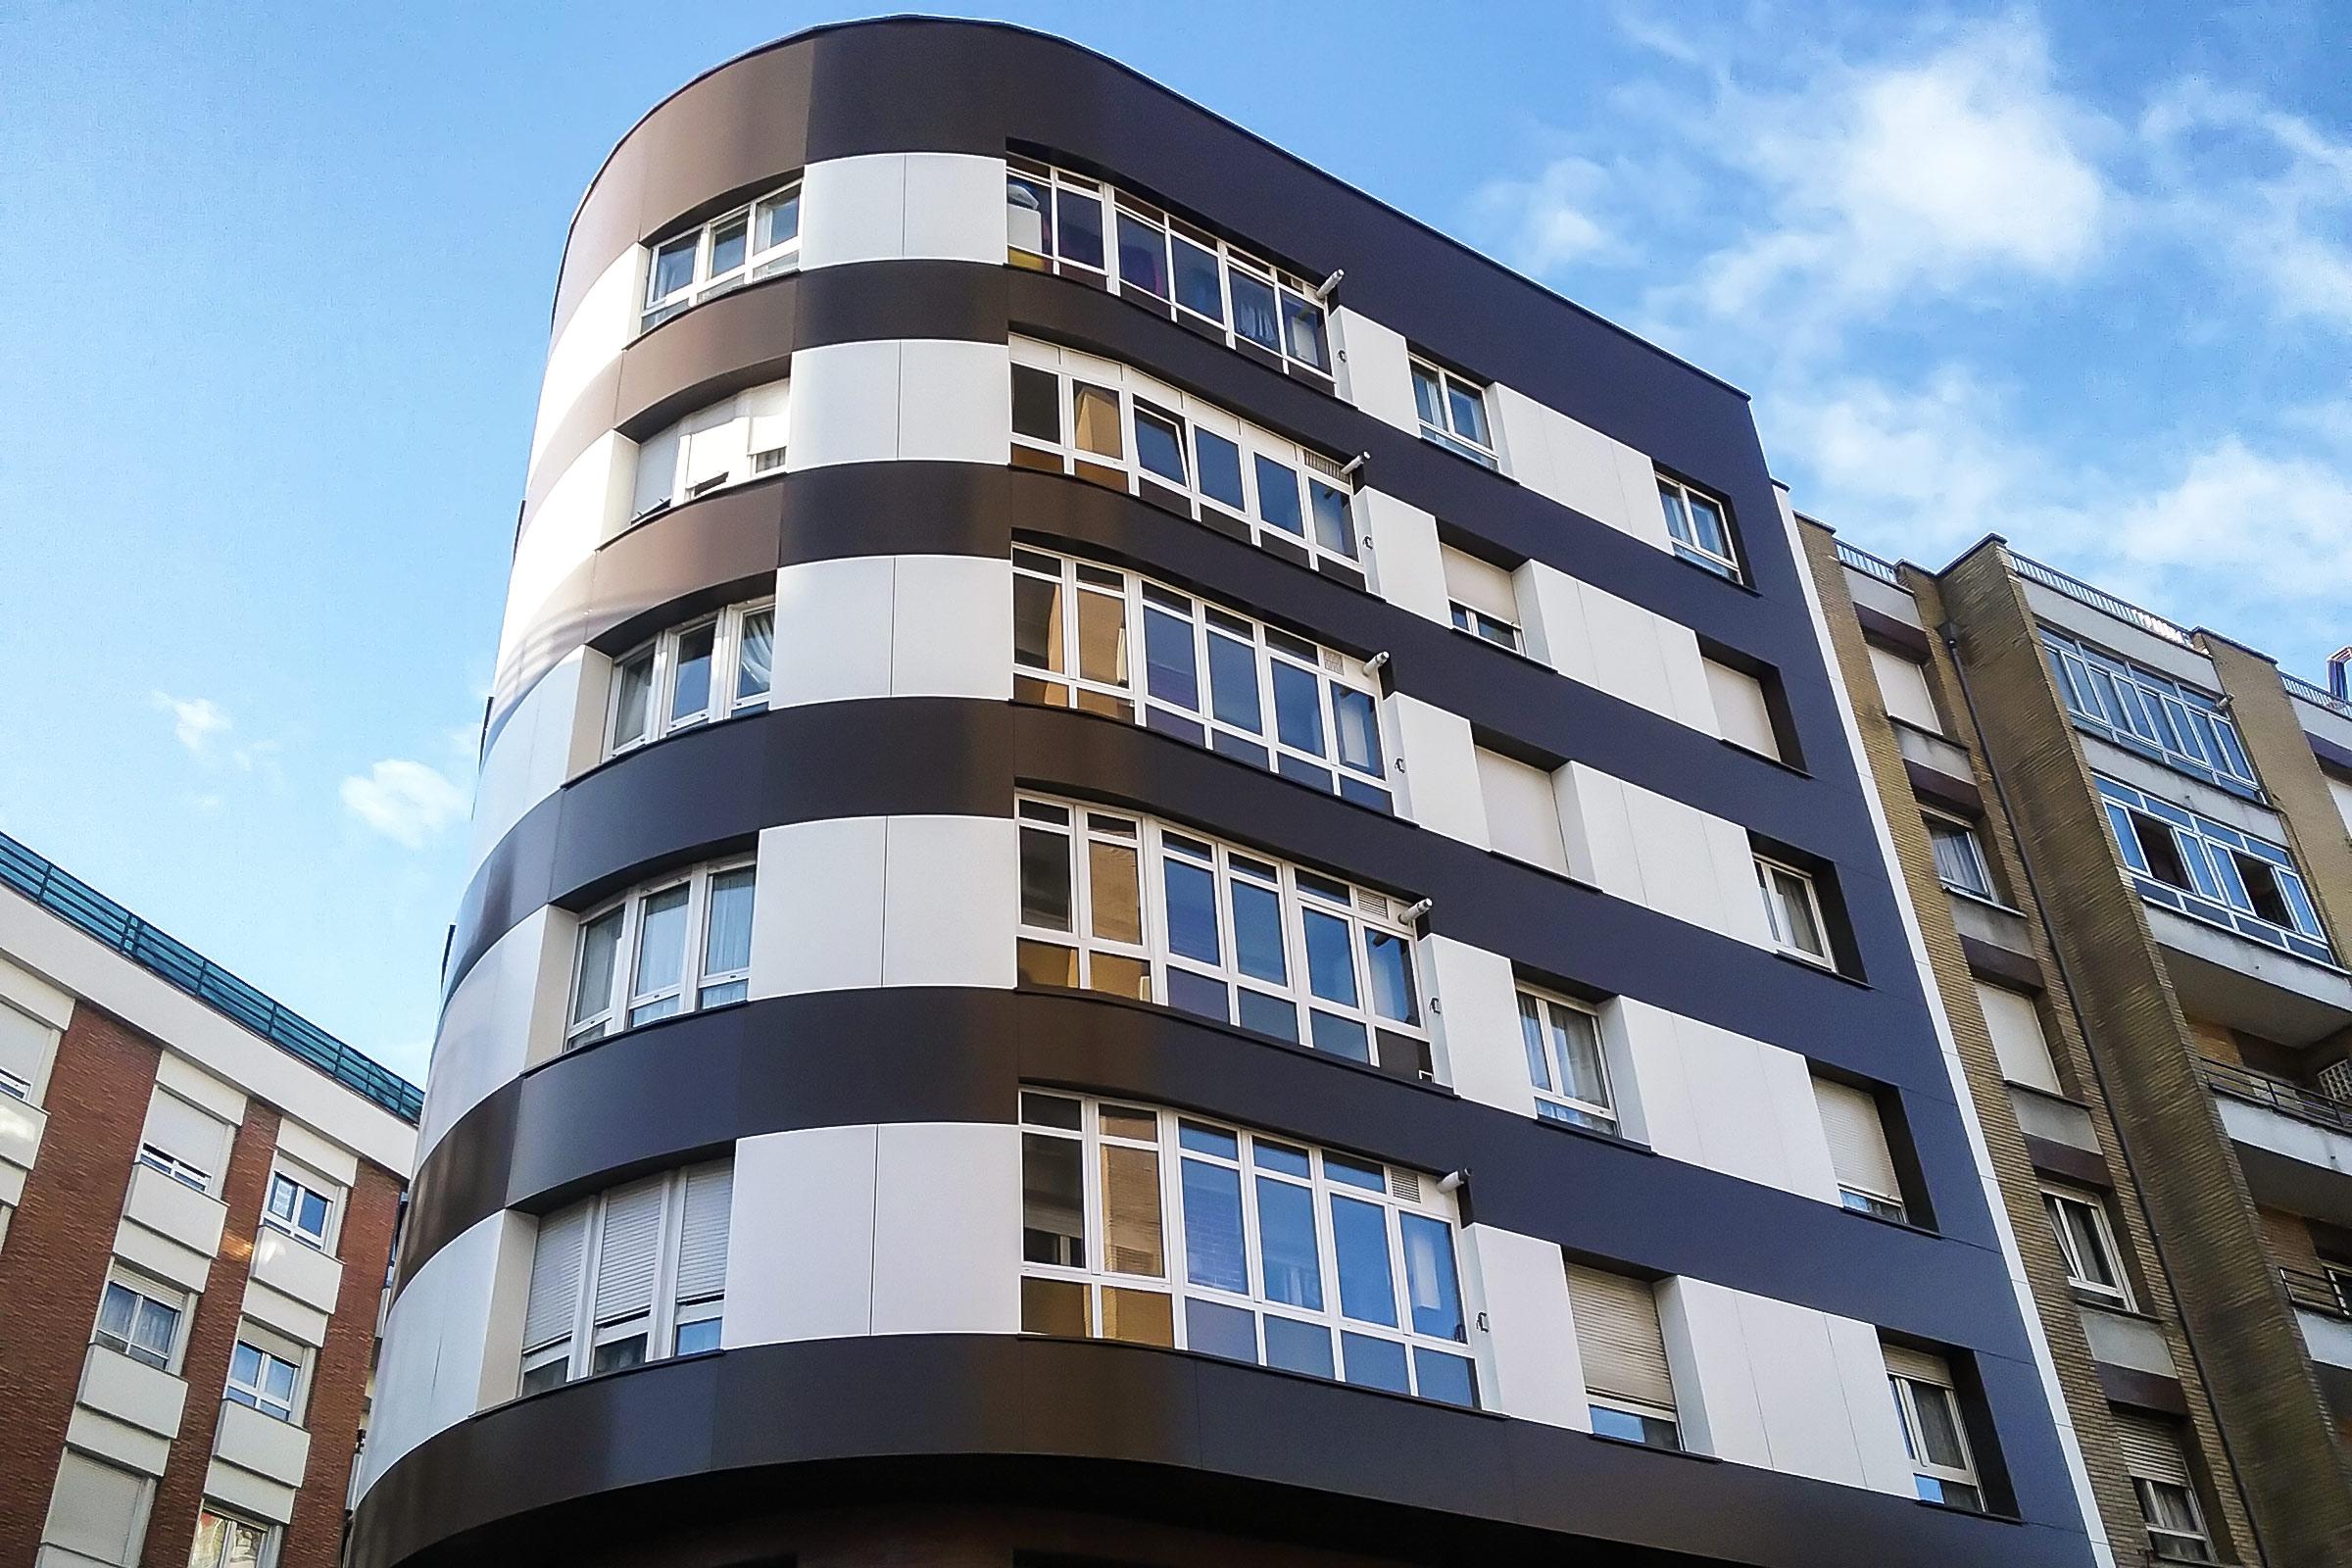 edificio-residencial-oviedo-STB-494